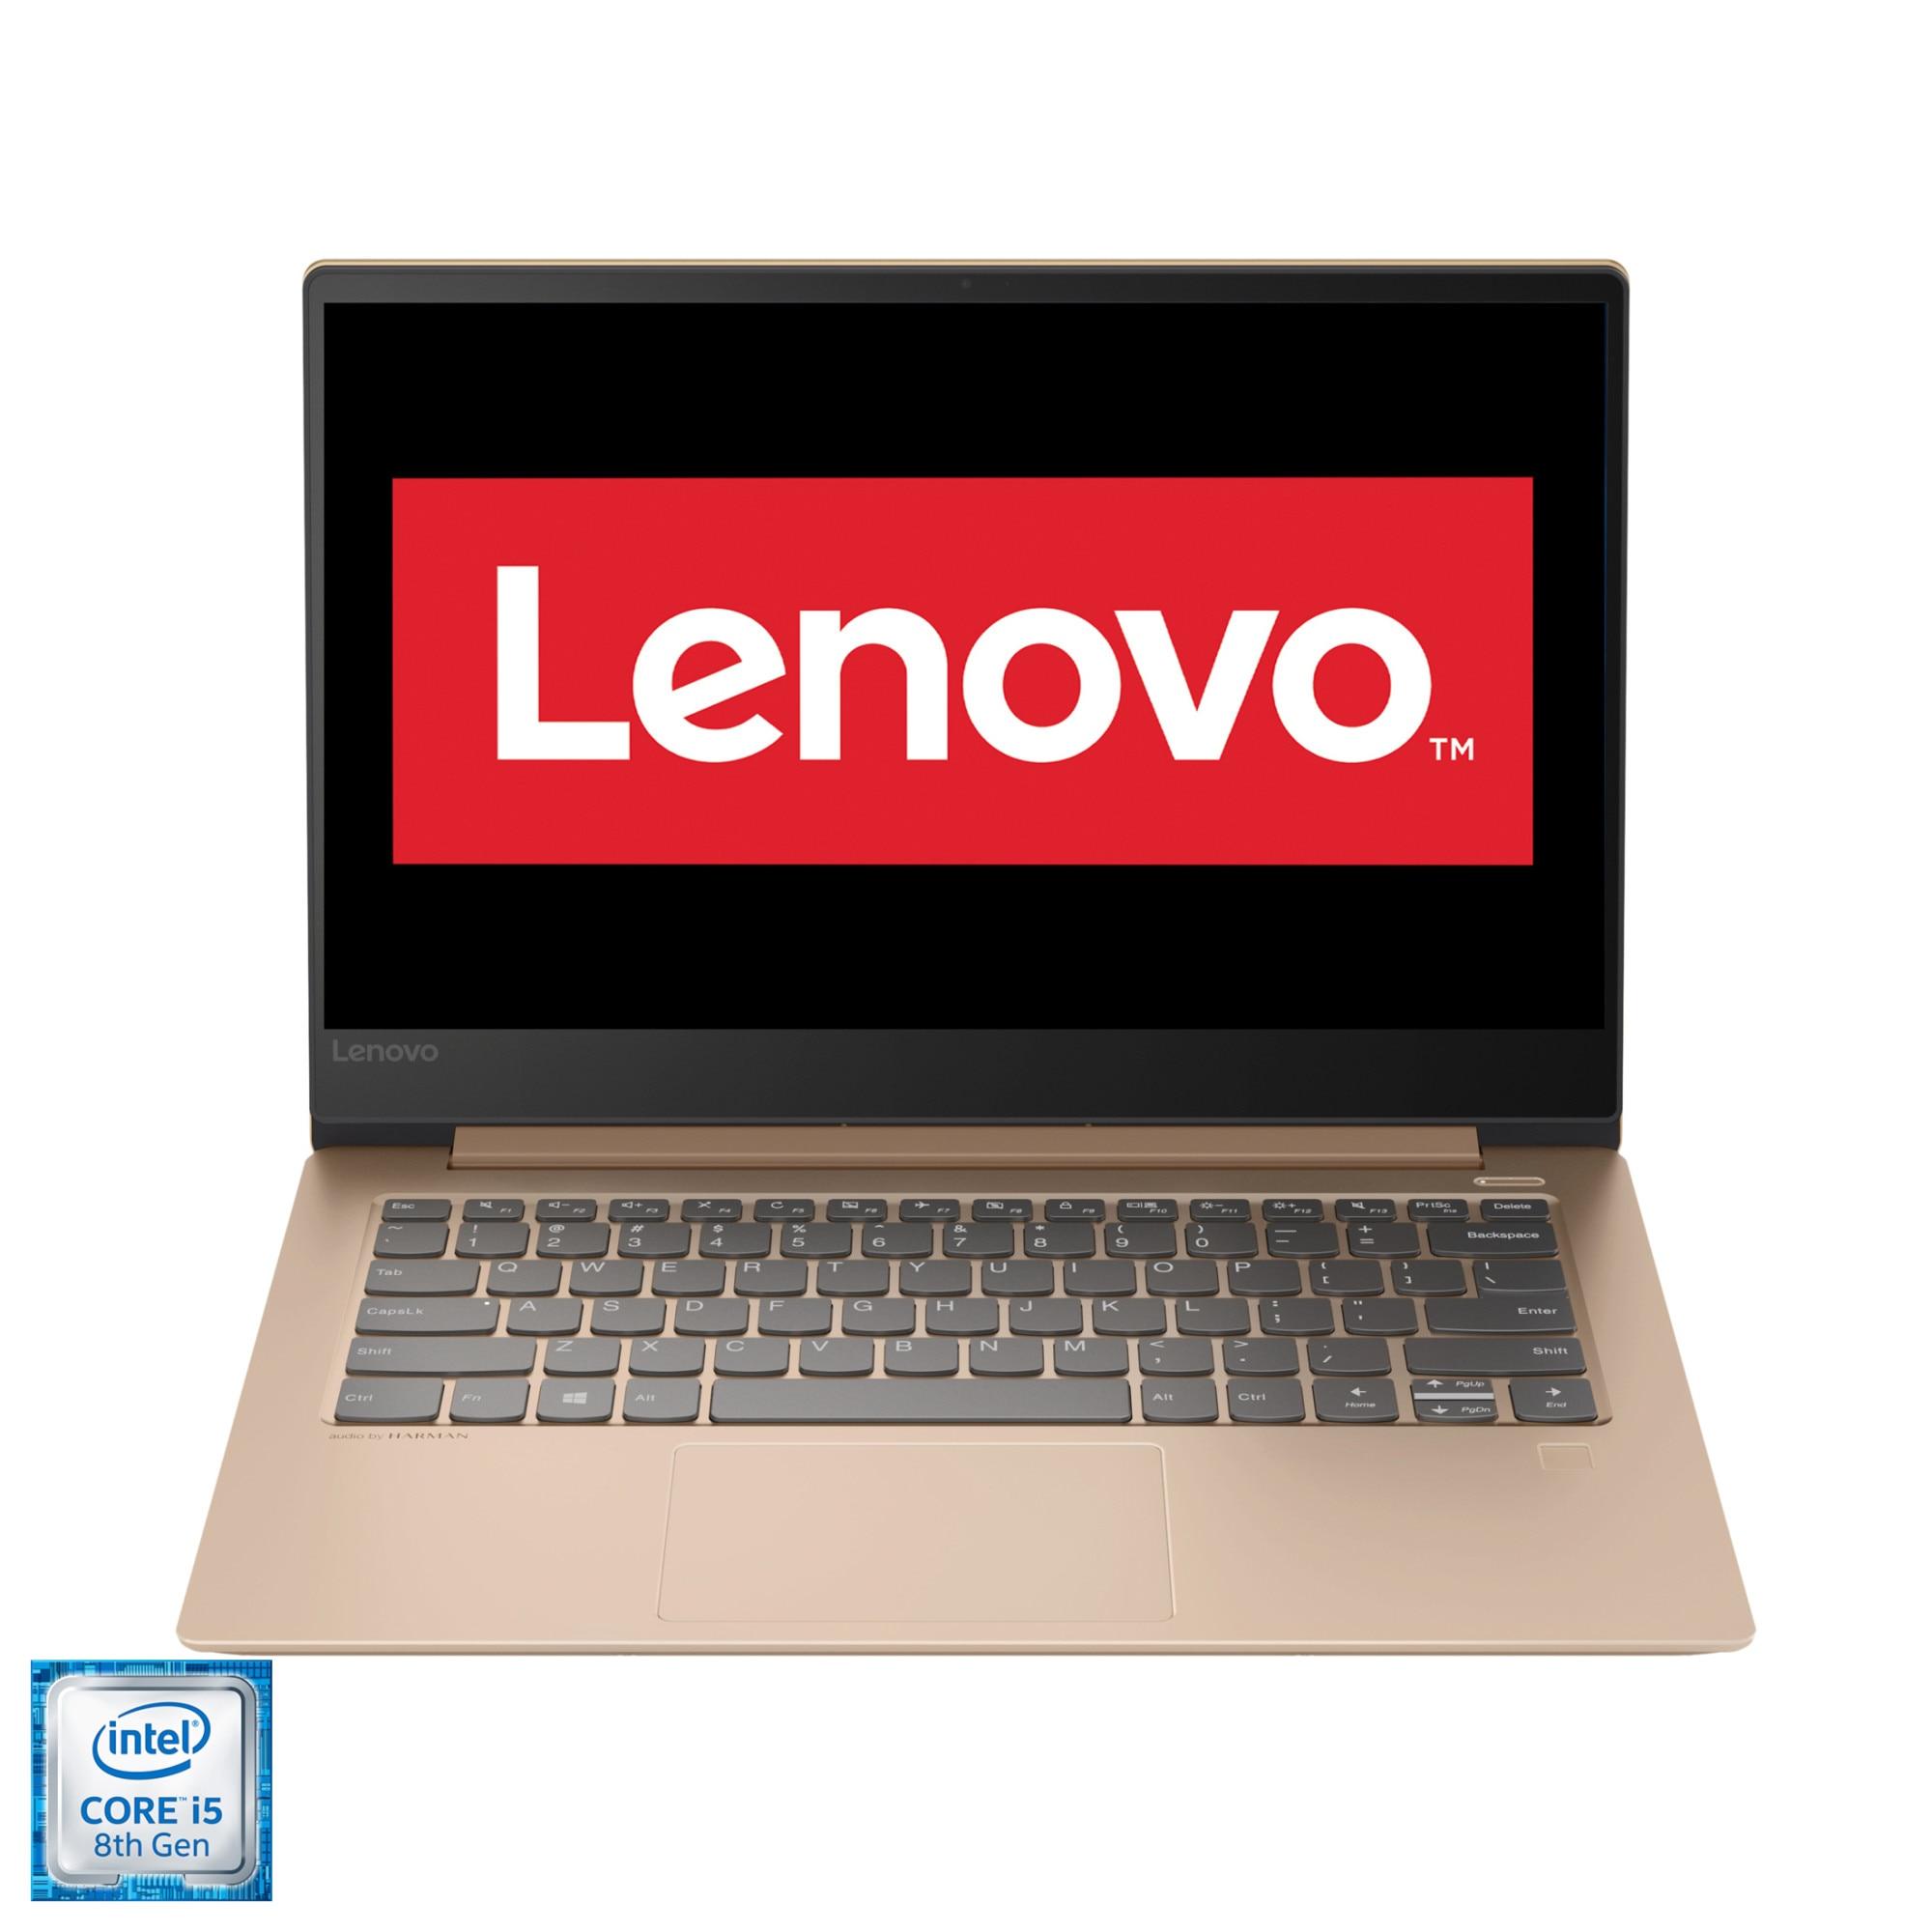 "Fotografie Laptop ultraportabil Lenovo IdeaPad 530S-14IKB cu procesor Intel® Core™ i5-8250U pana la 3.40 GHz, Kaby Lake R, 14"". WQHD, IPS, 8GB, 512GB M.2 SSD, Intel® UHD Graphics 620, FPR, Free DOS, Copper"